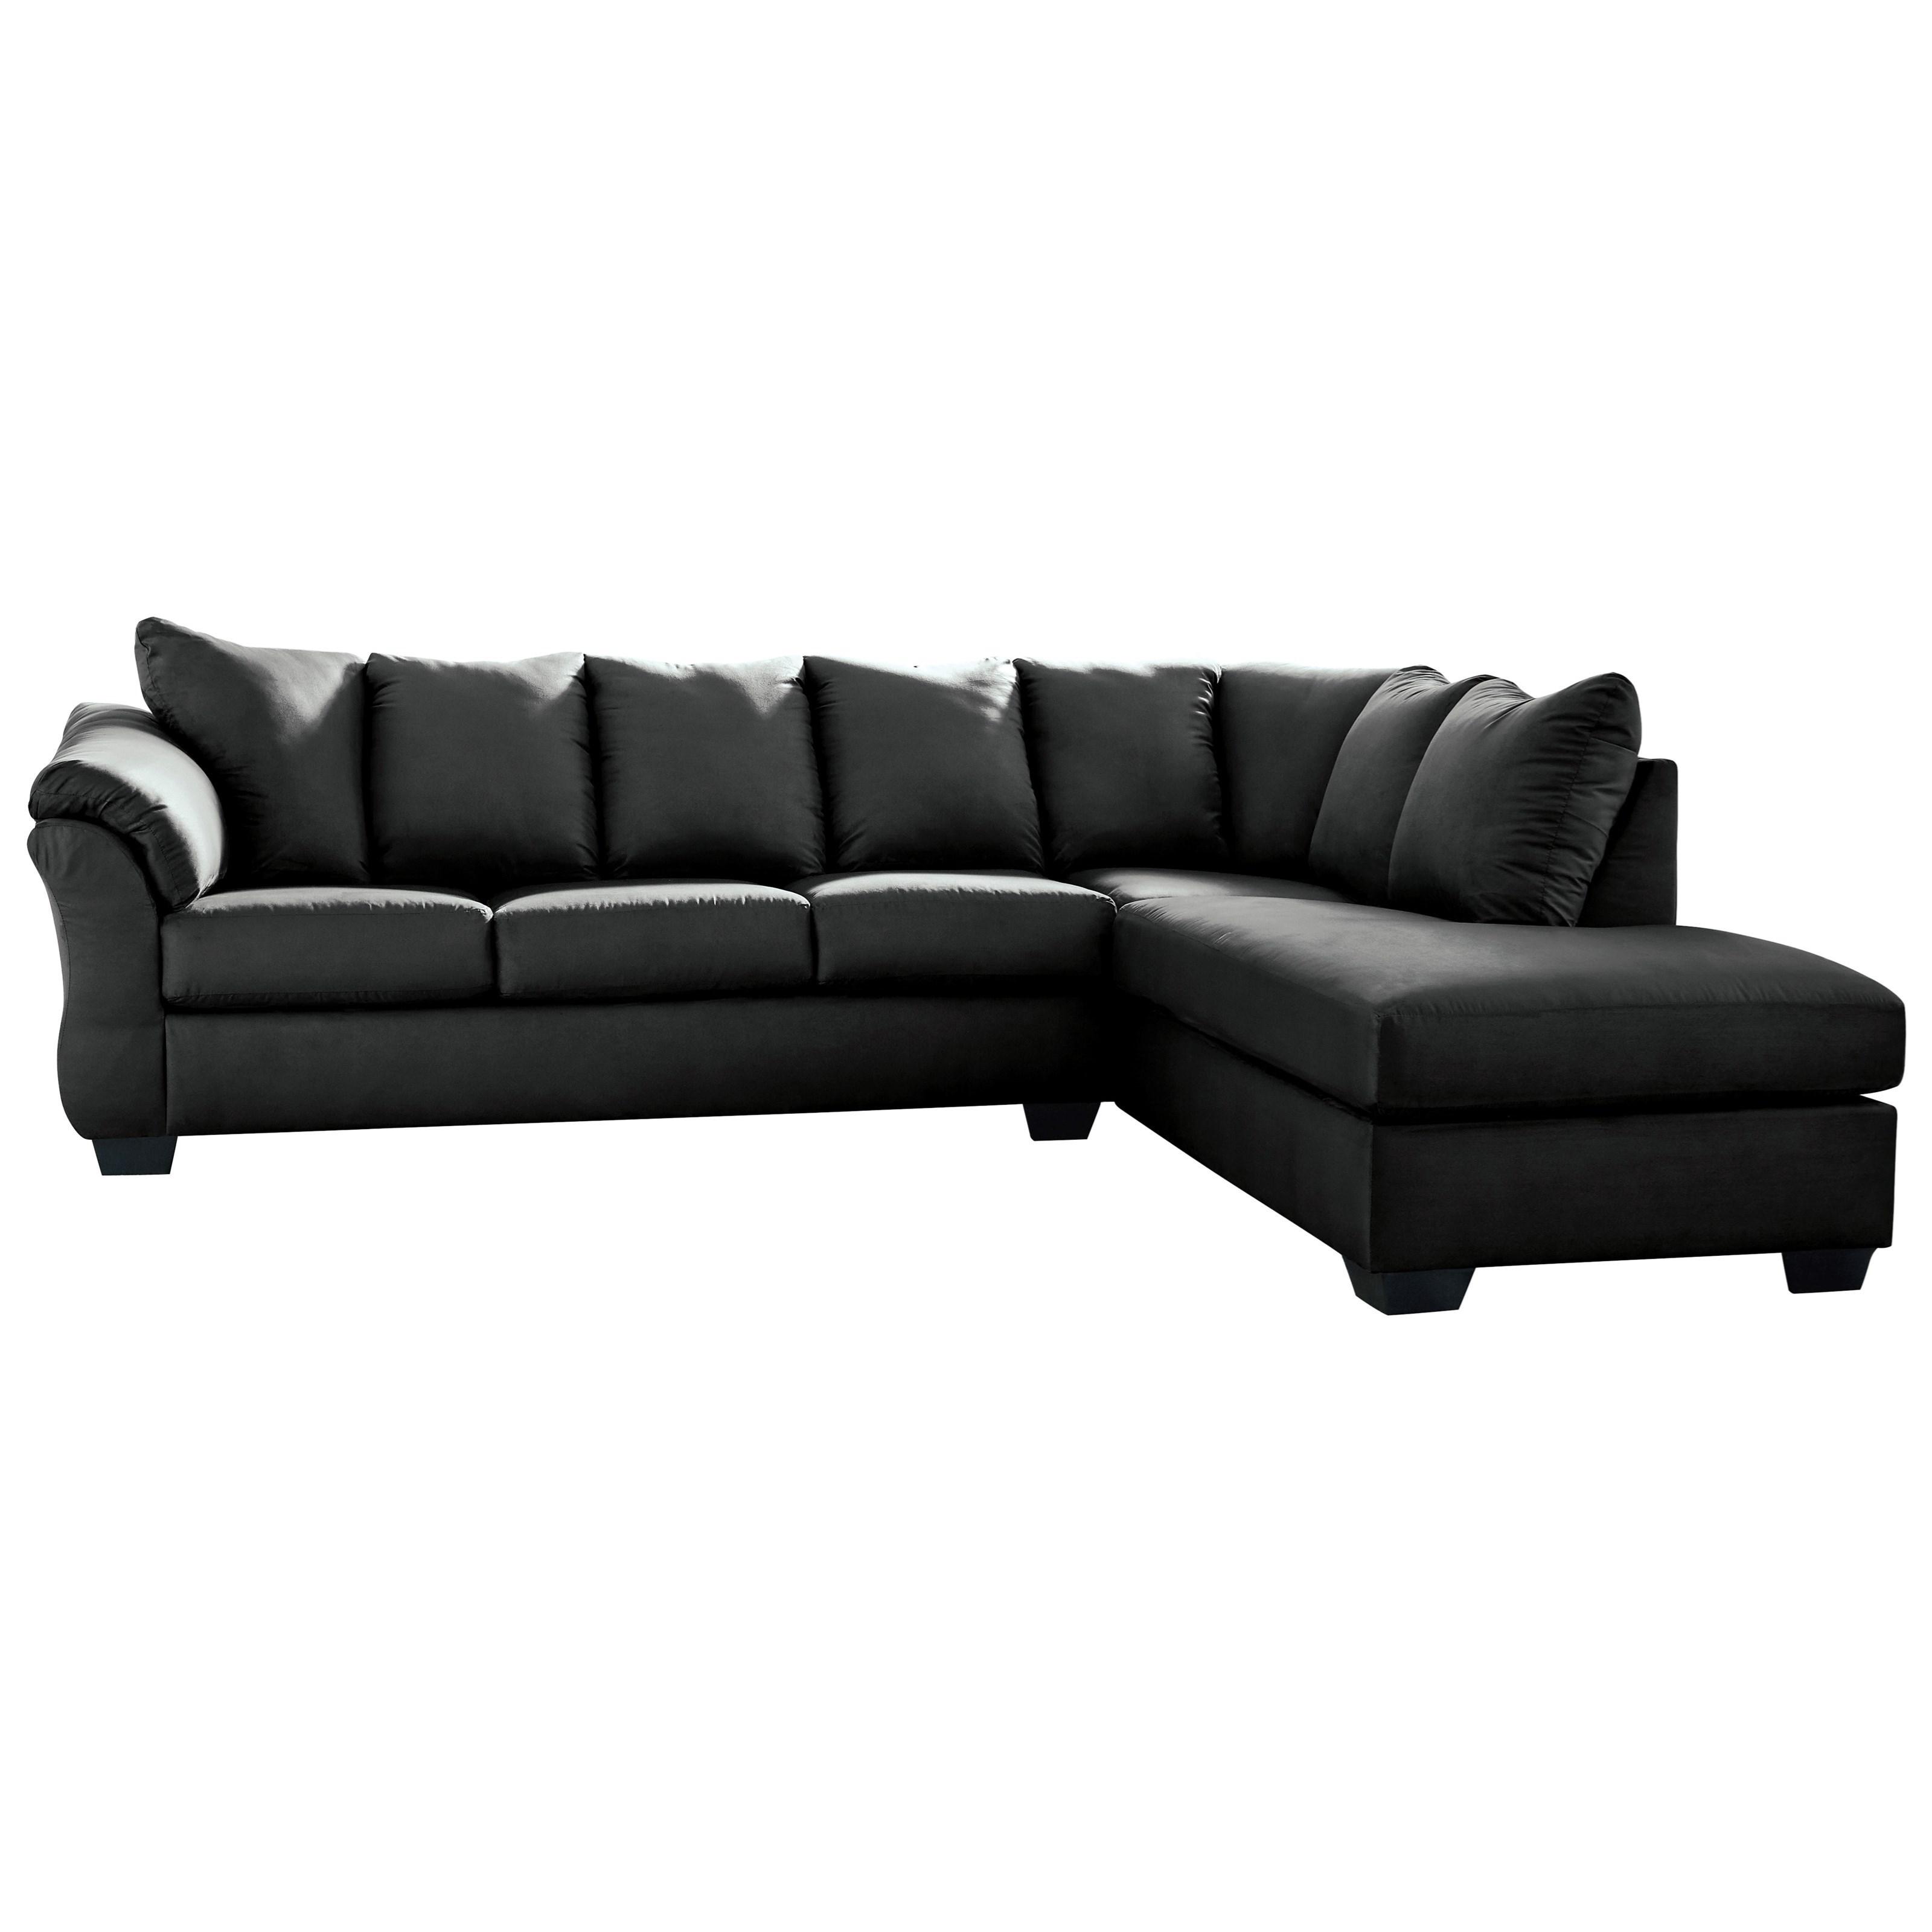 Ashley Signature Design Darcy - Black Contemporary Sectional Sleeper ...